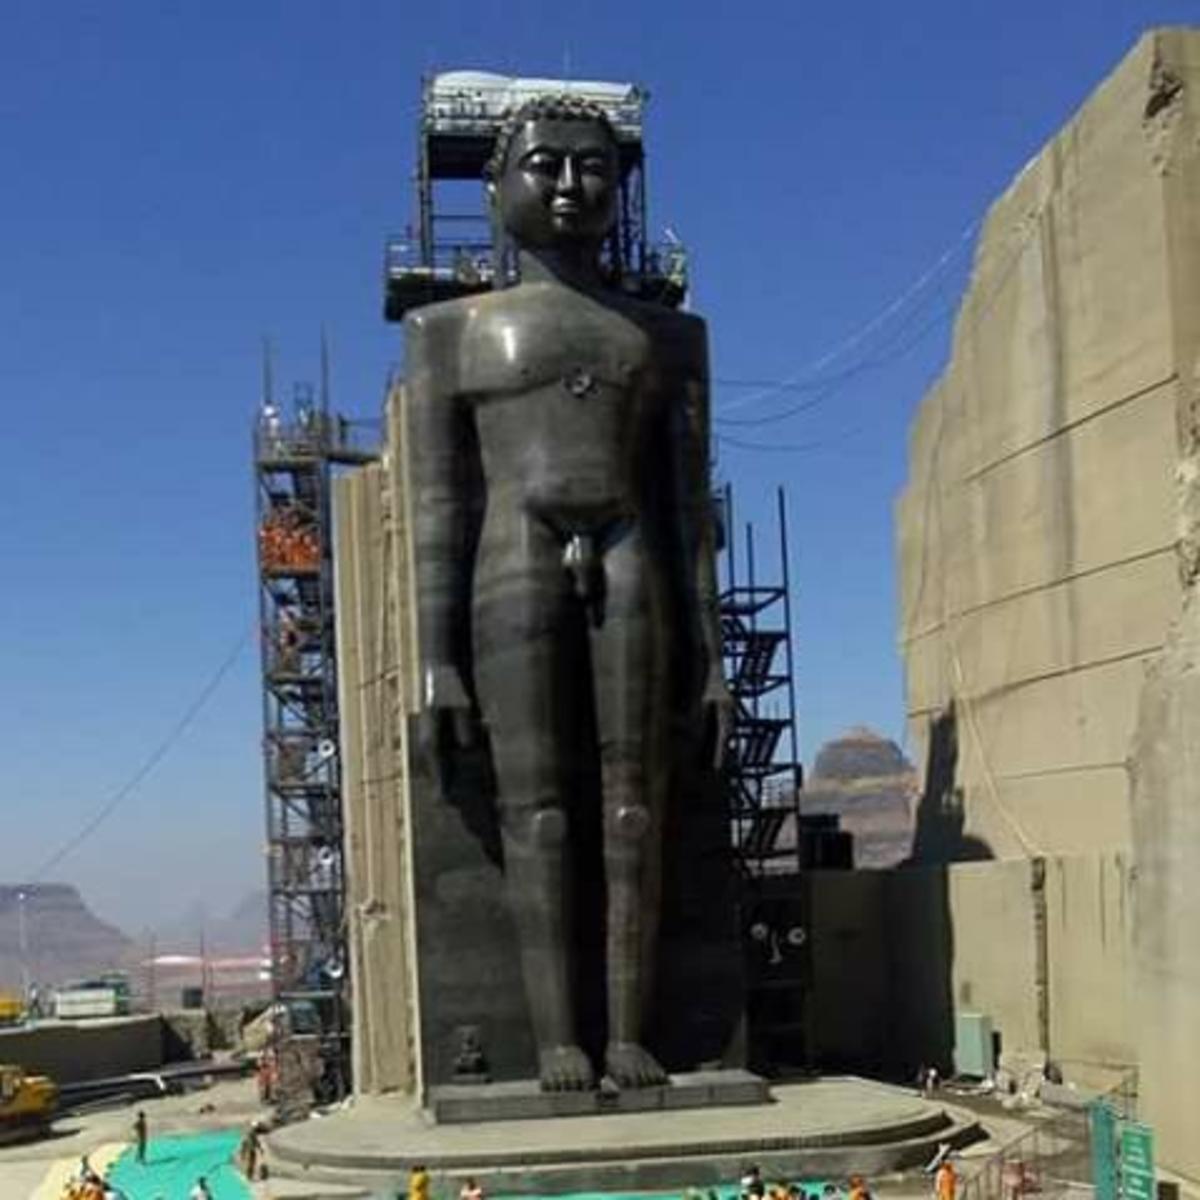 This is the tallest Jain statue in the world depicting  first Jain Tirthankara, Rishabhanatha.